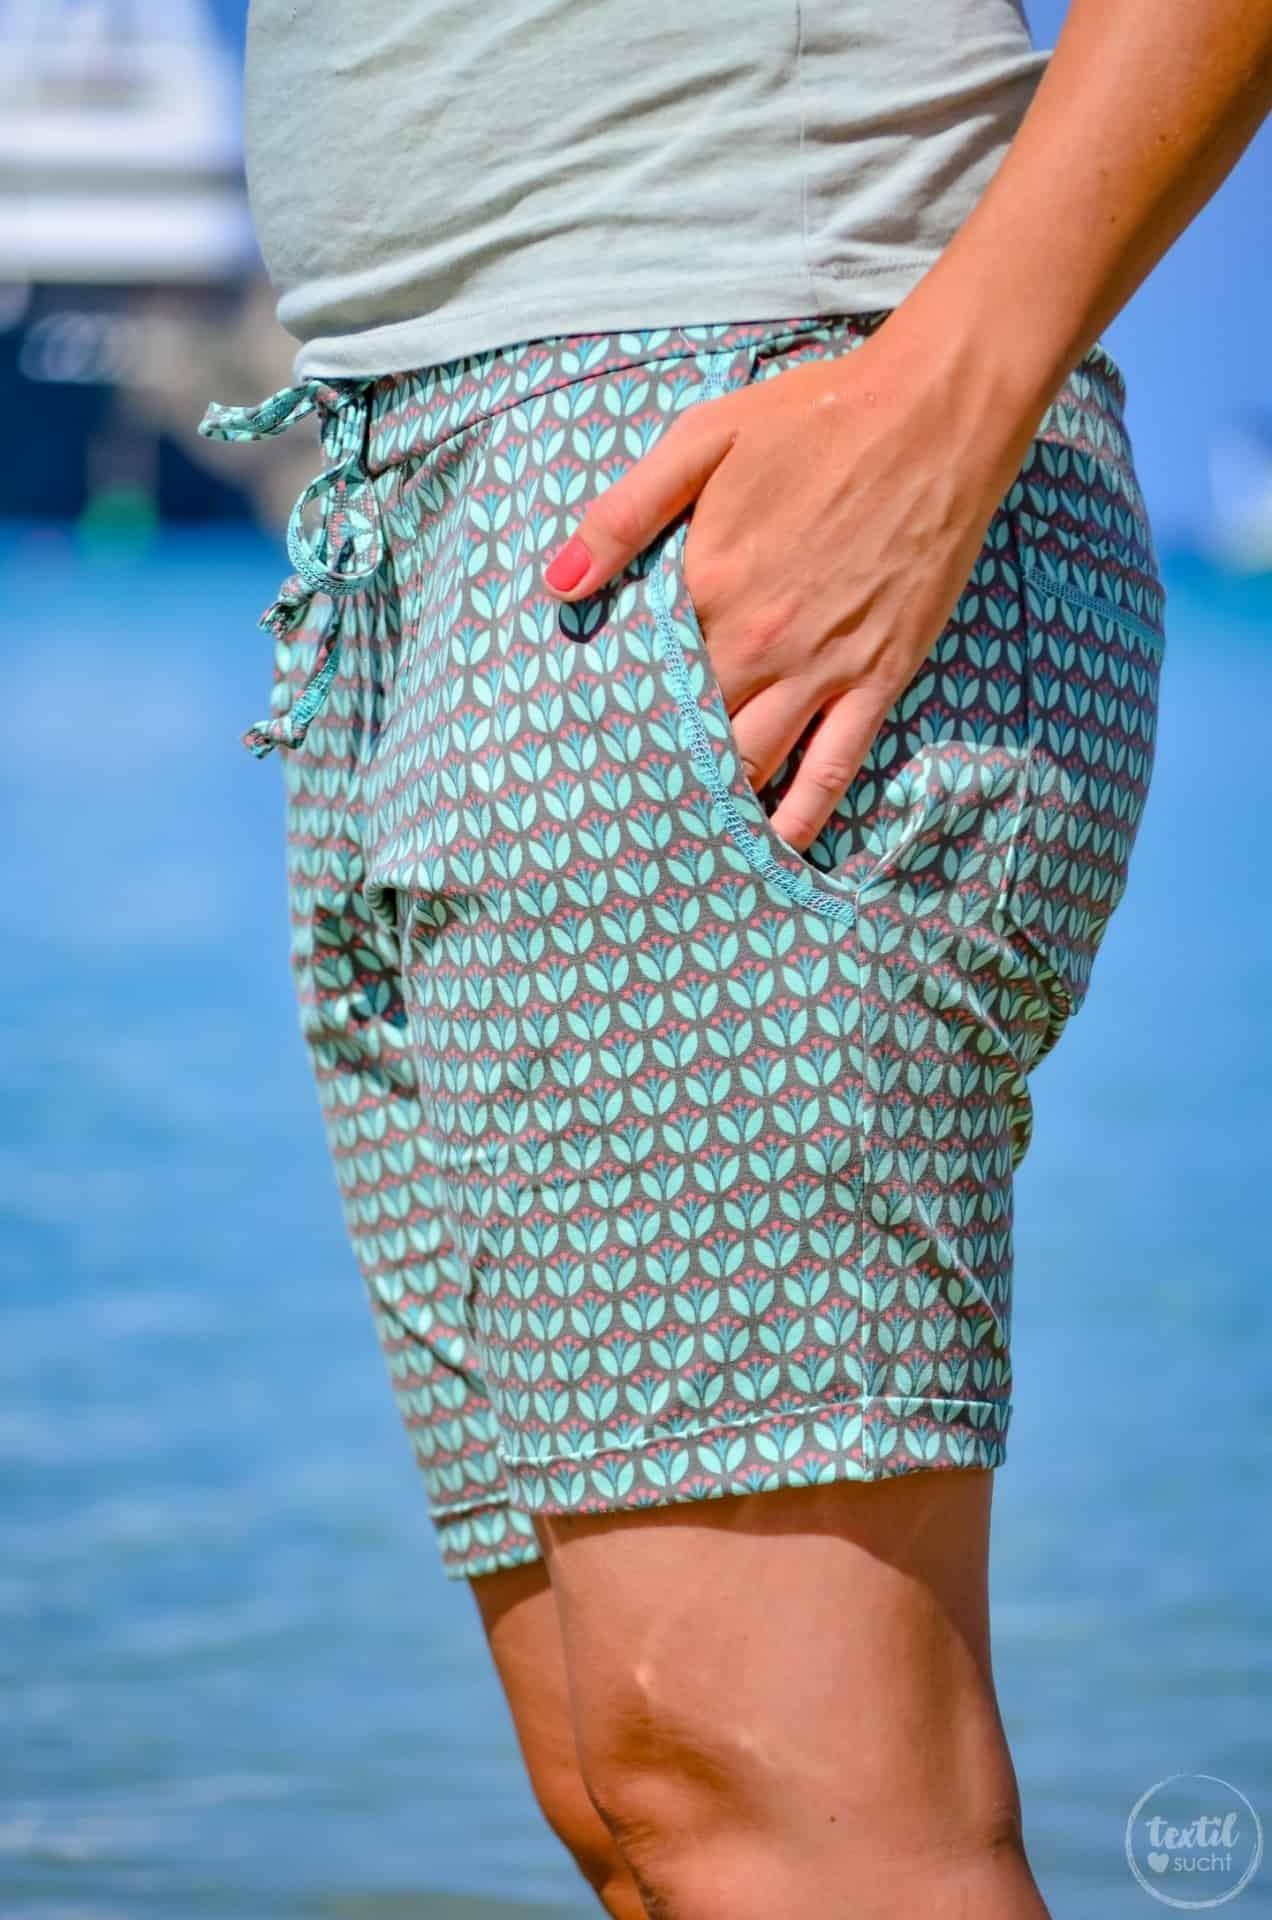 Nähen für den Strand: Schnittmuster Velara als Shorts - Bild 4   textilsucht.de